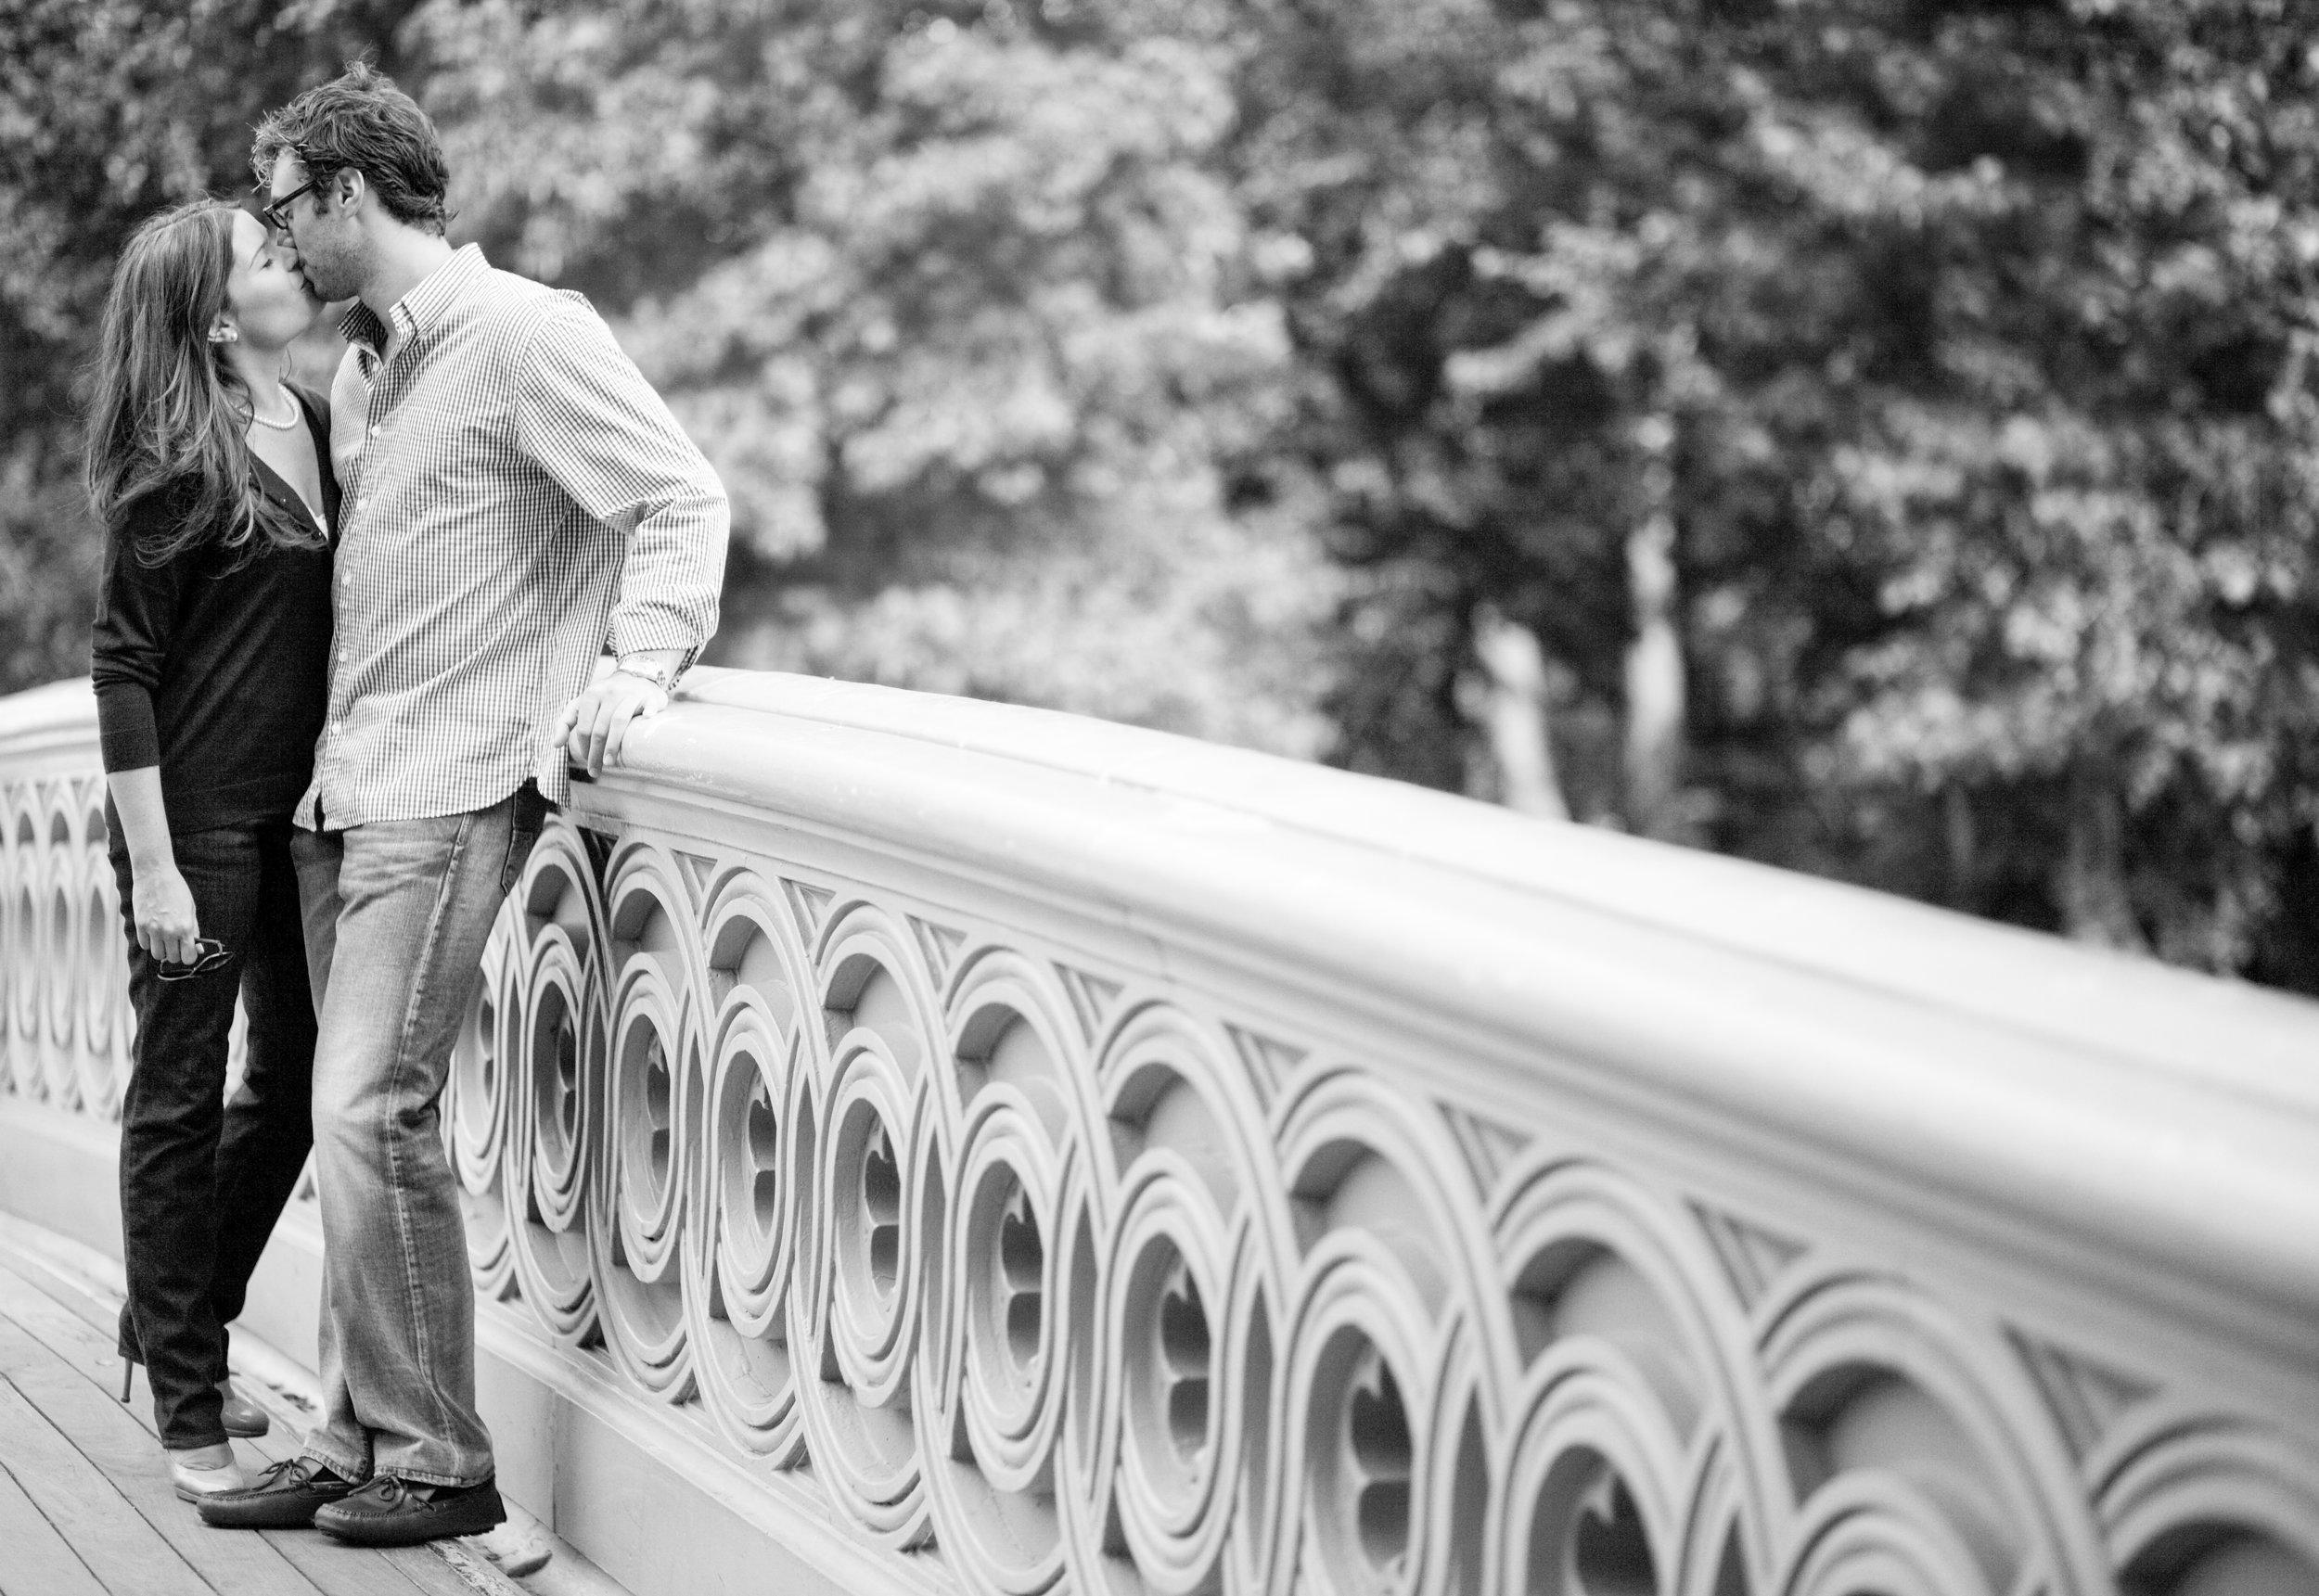 JJ-Ignotz-NYC-Photographer-engagements_006.jpg